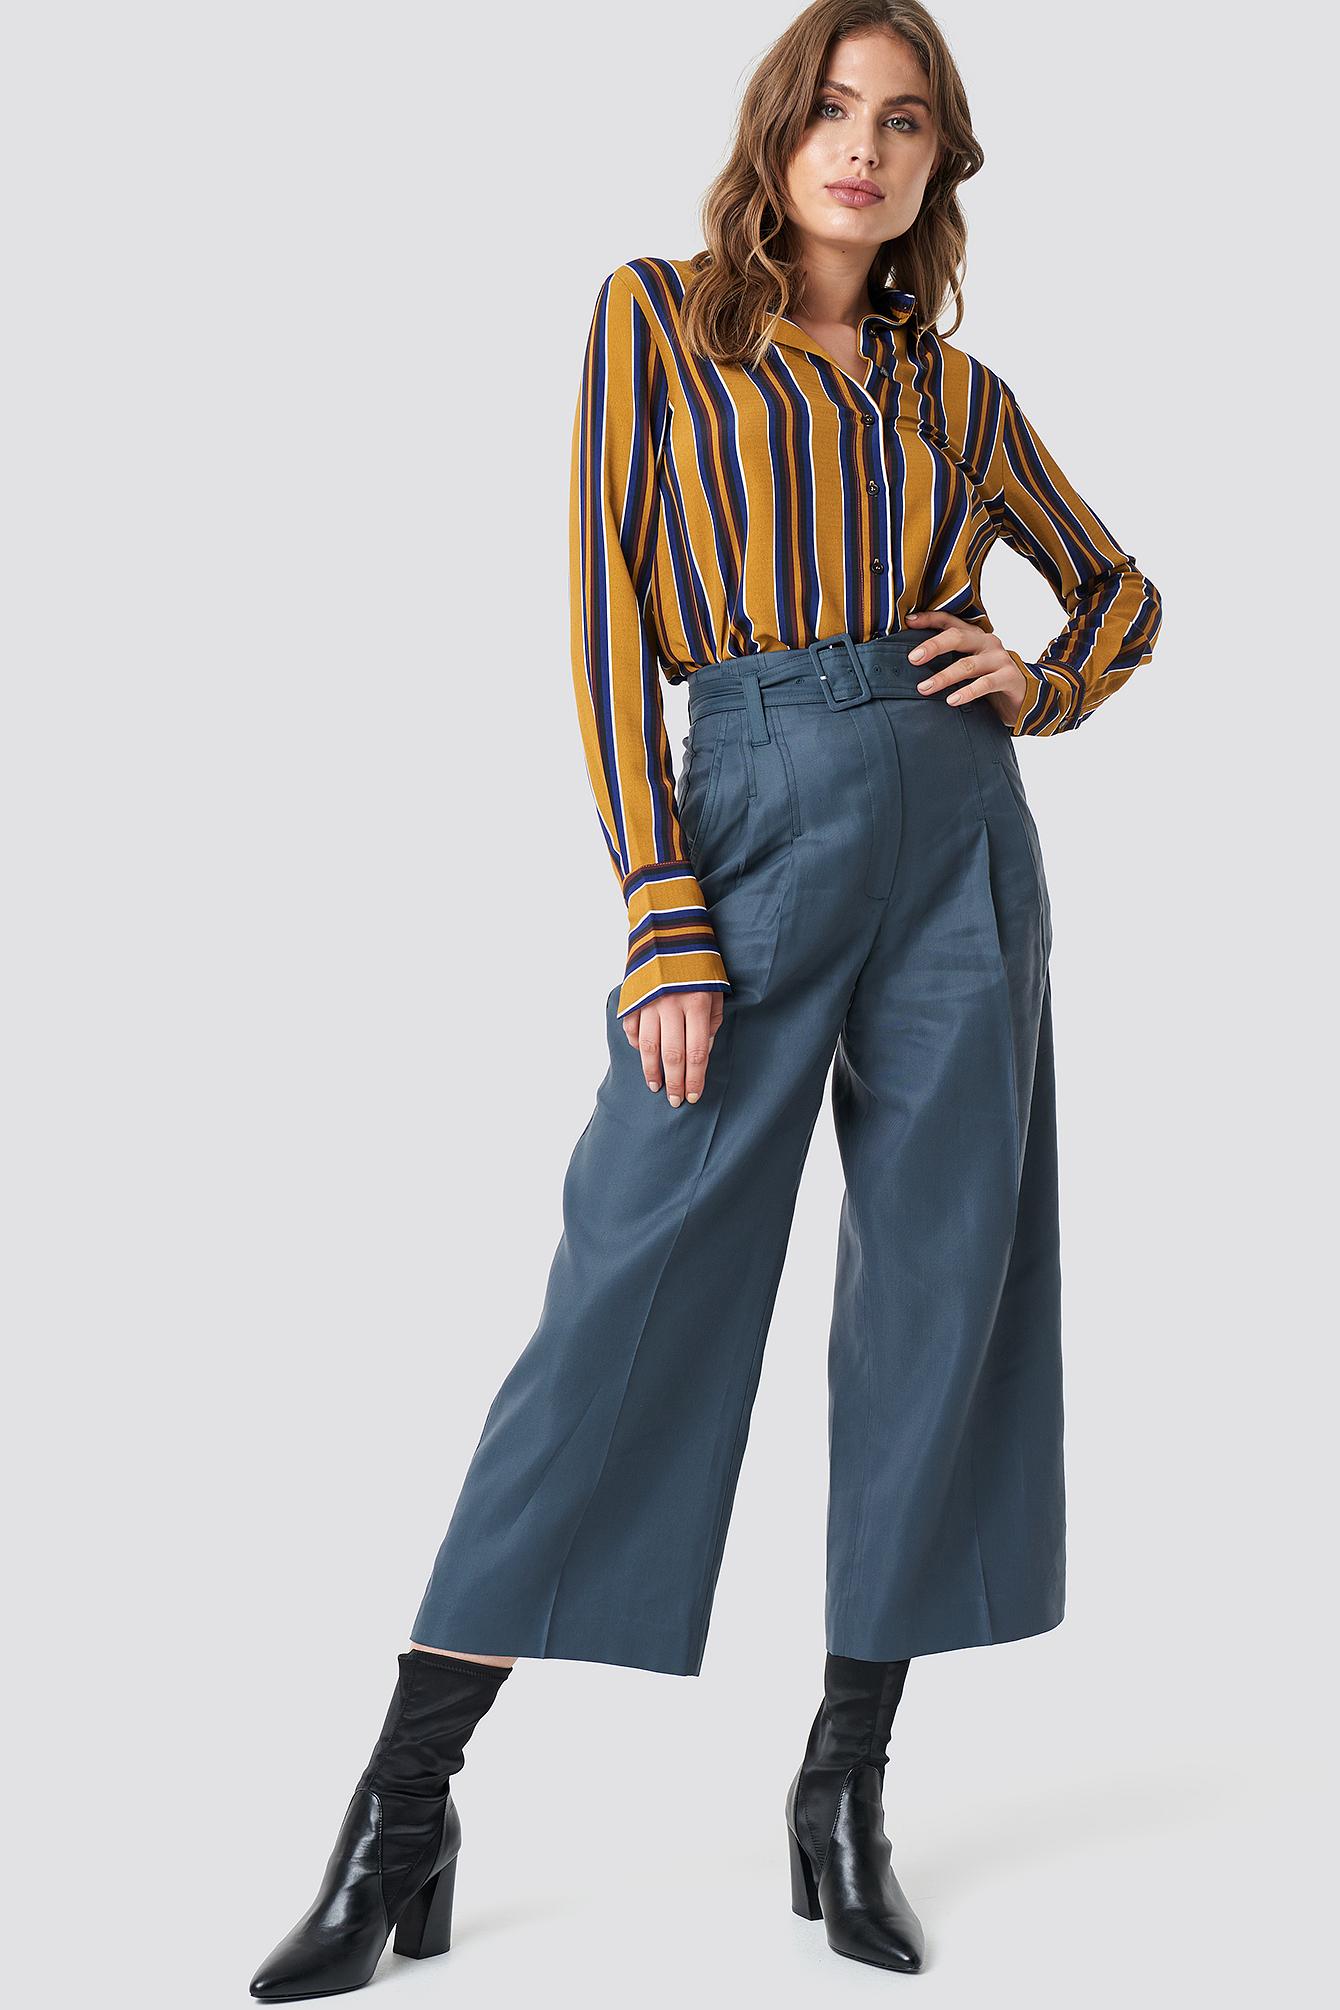 mango -  Linus Trousers - Blue